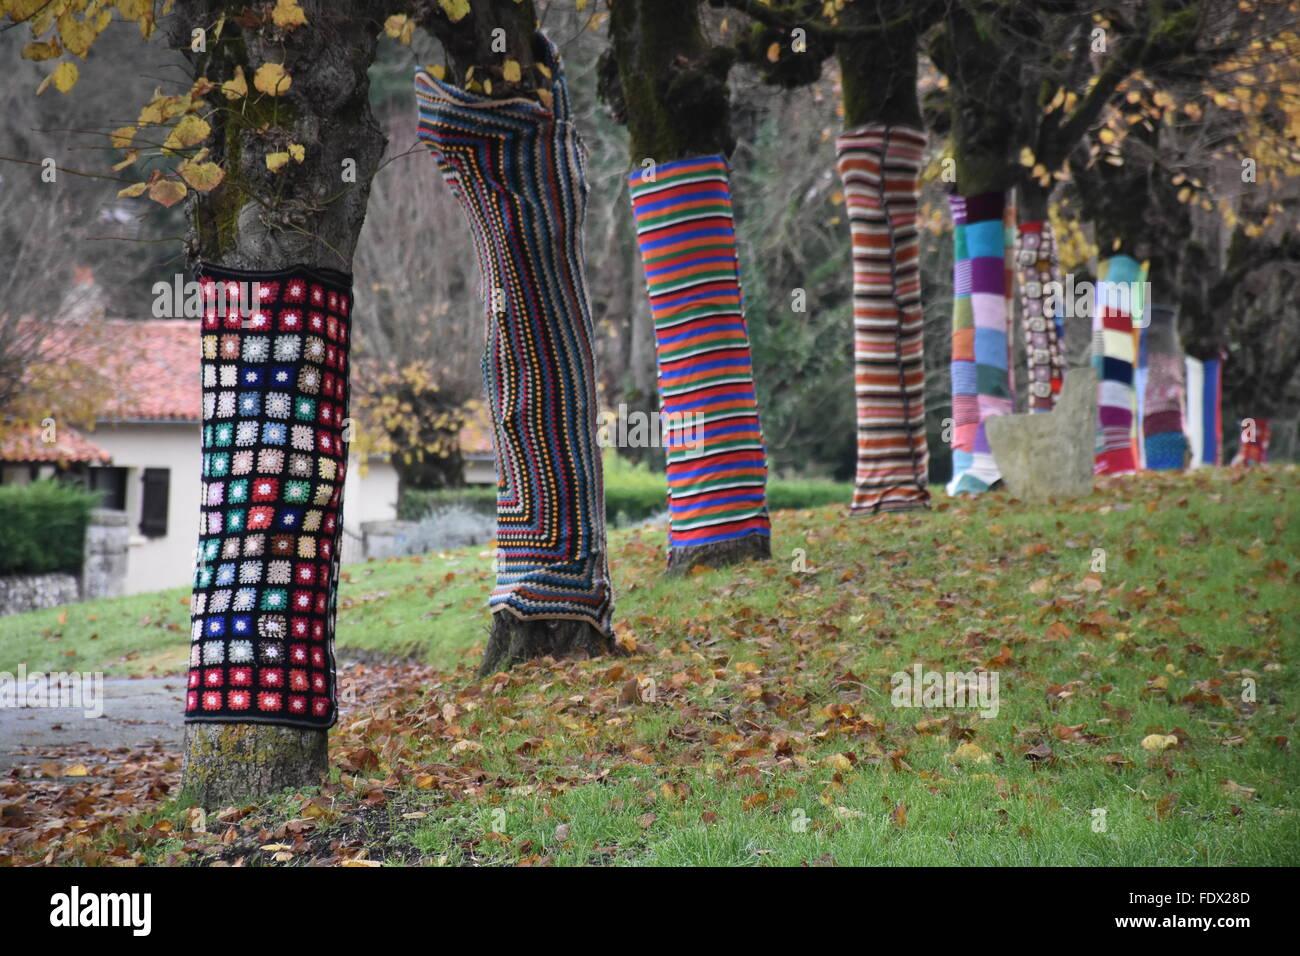 Decorated trees beside the Eglise de Charroux (Charroux church) Vienne (86) France - Stock Image